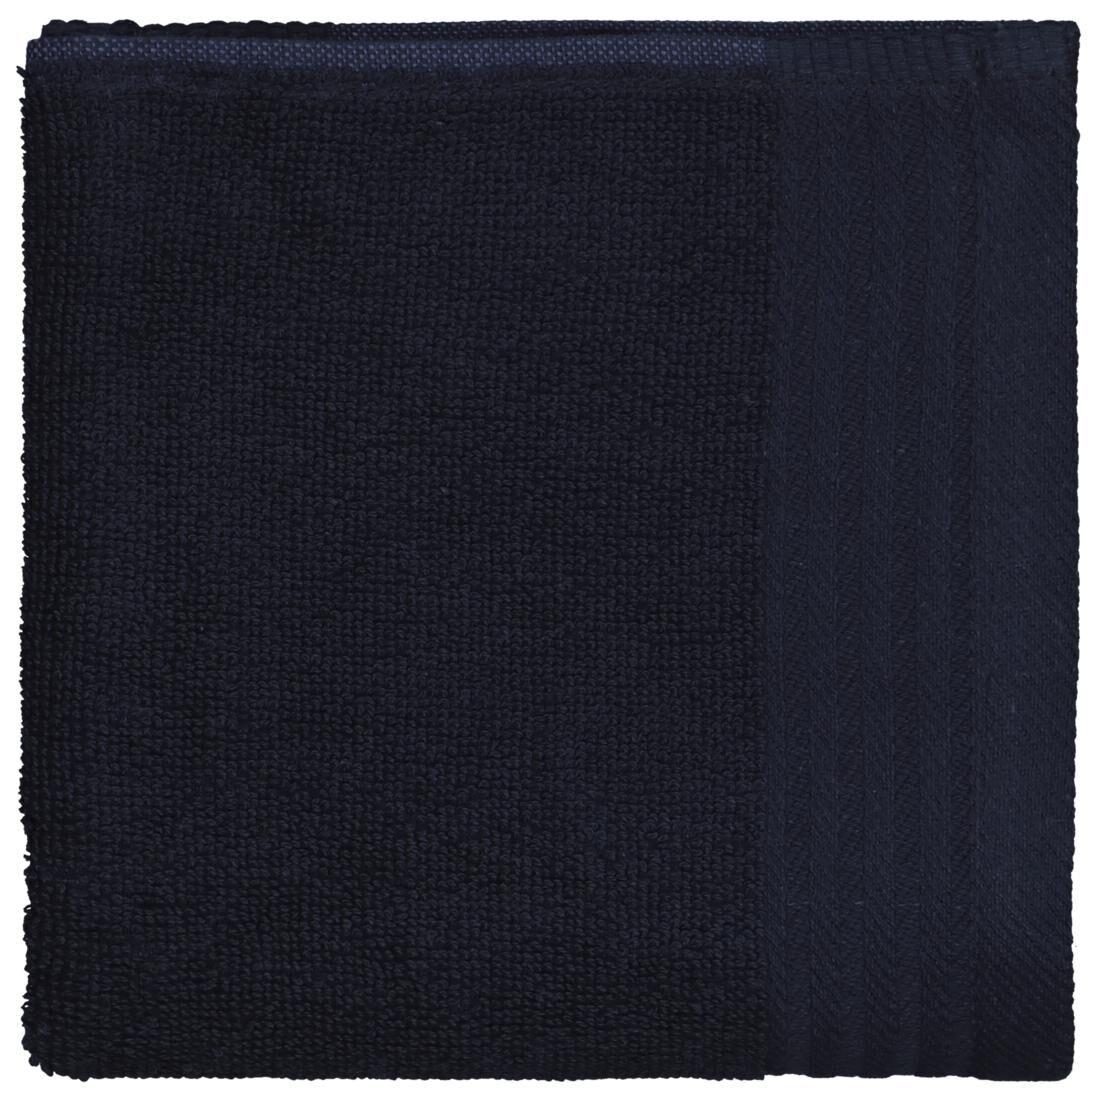 HEMA Keukendoek 50x50 Katoen Donkerblauw